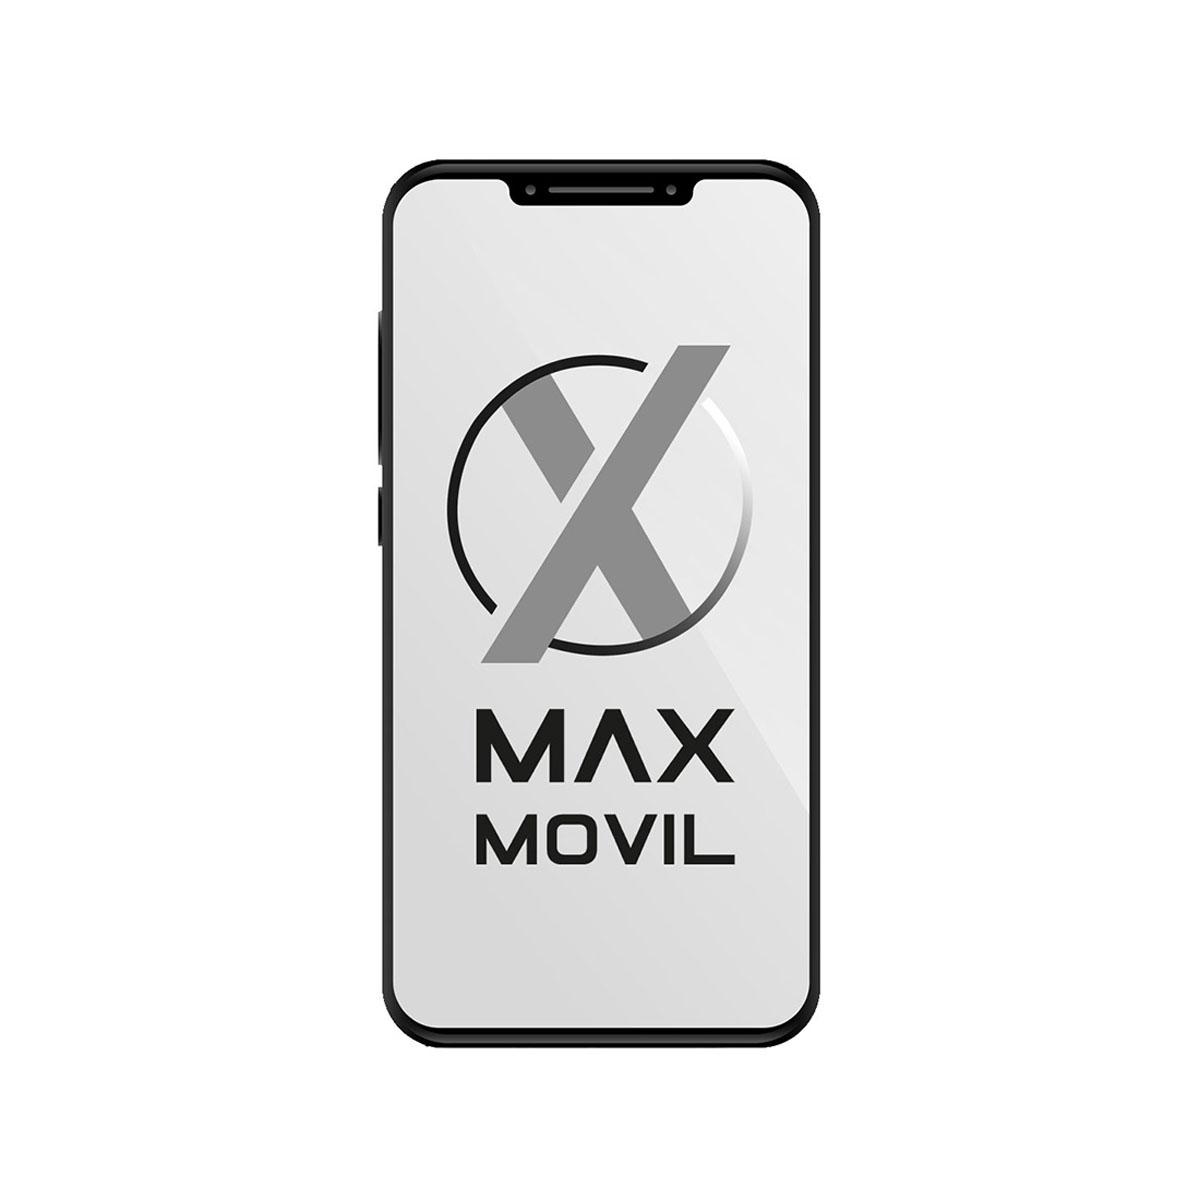 Motorola Moto G9 Play 4GB/64GB Verde (Forest Green) Dual SIM XT2083-3